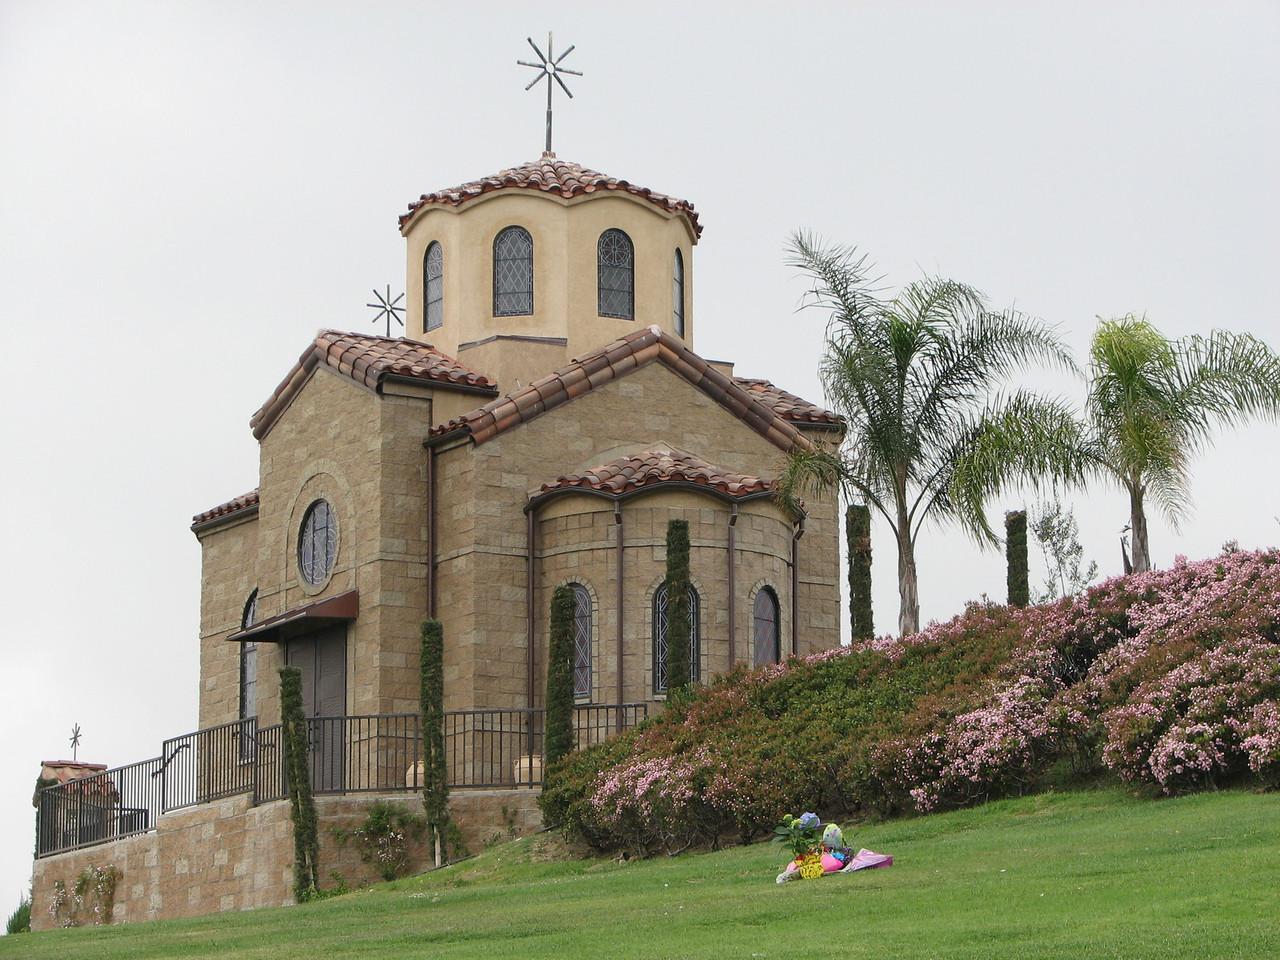 2007 03 26 Mon - Dan Nguyen's gravesite @ Rose Hills cemetary - with chapel 1